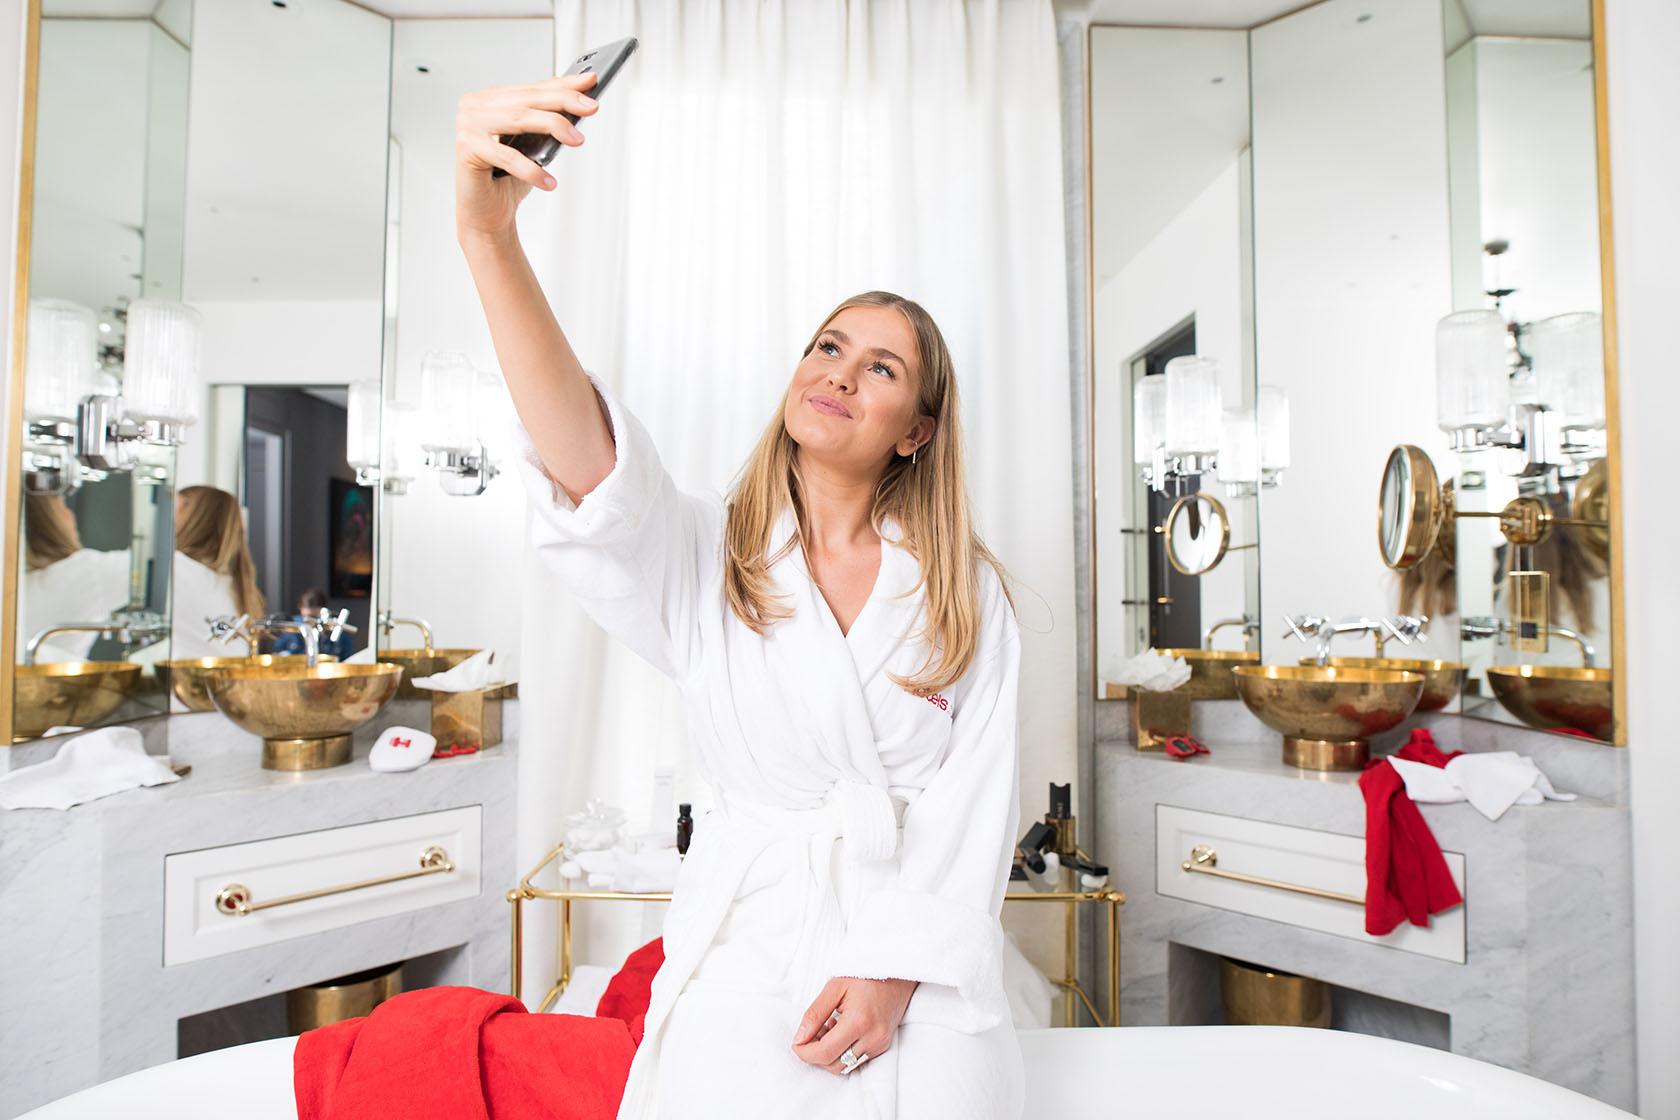 Selfie stick suprato dal bathroom selfie